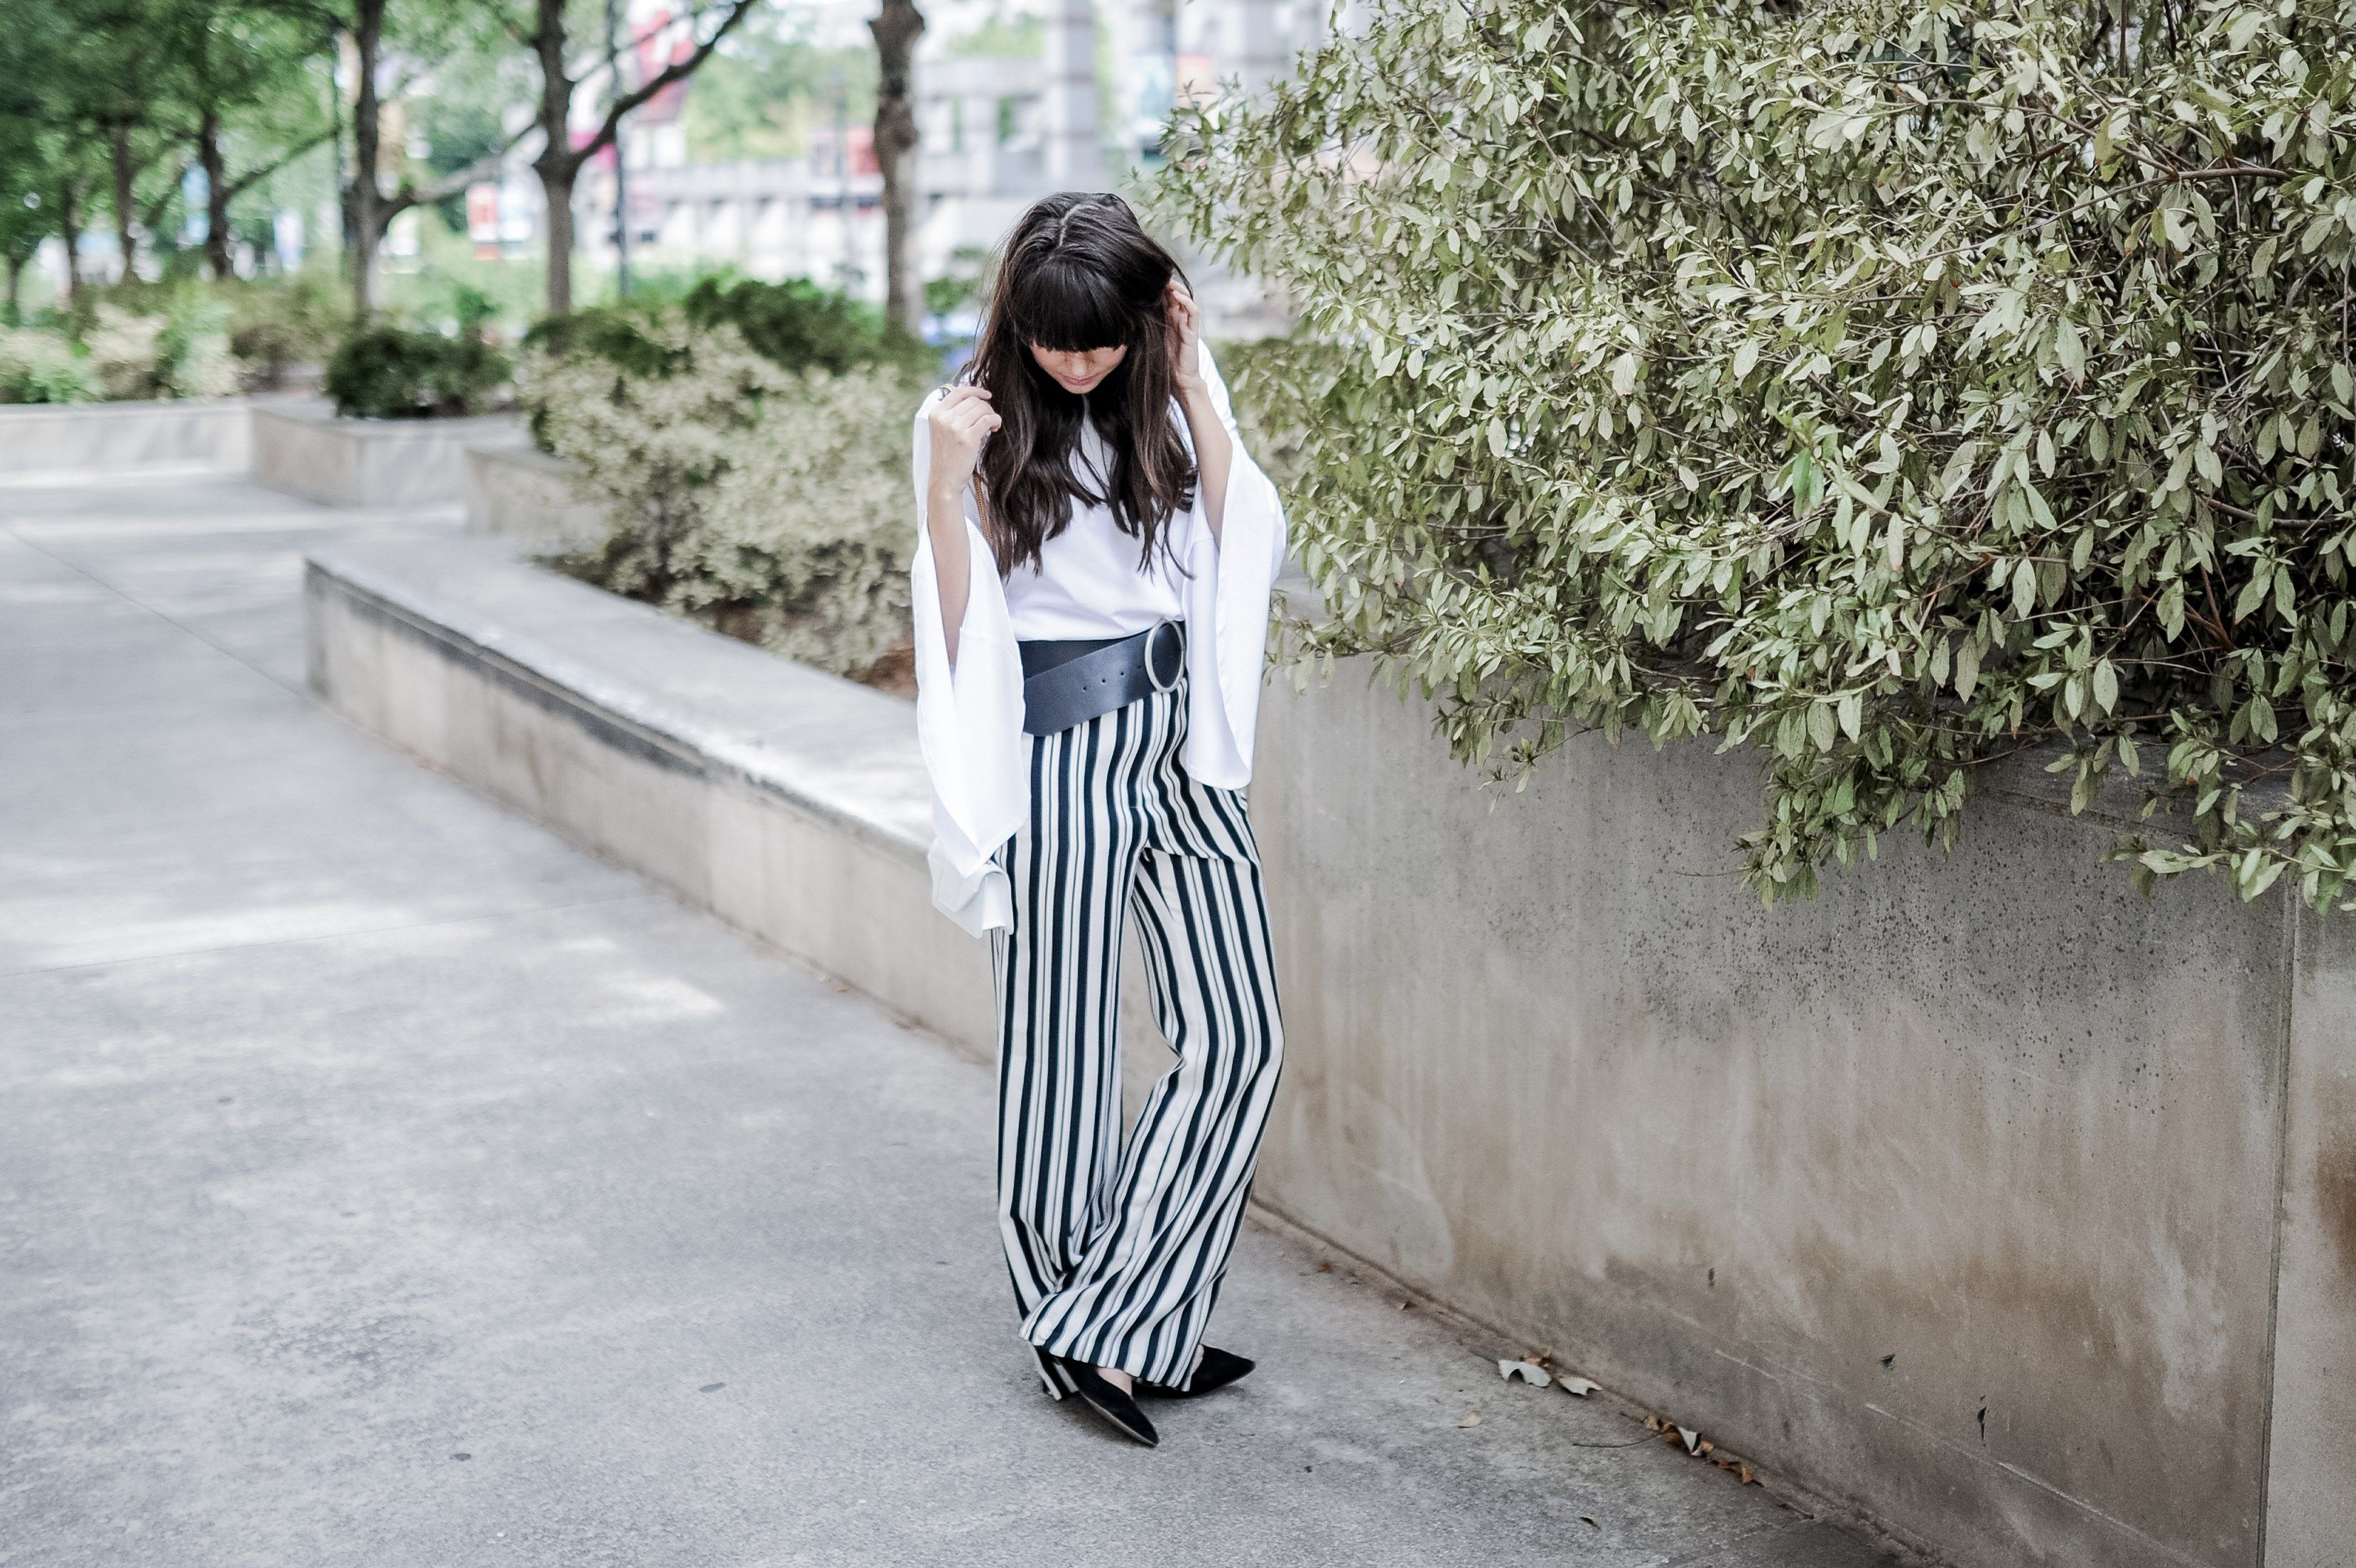 related-apparel-striped-pants-zara-top-5.jpg (3316×2207)